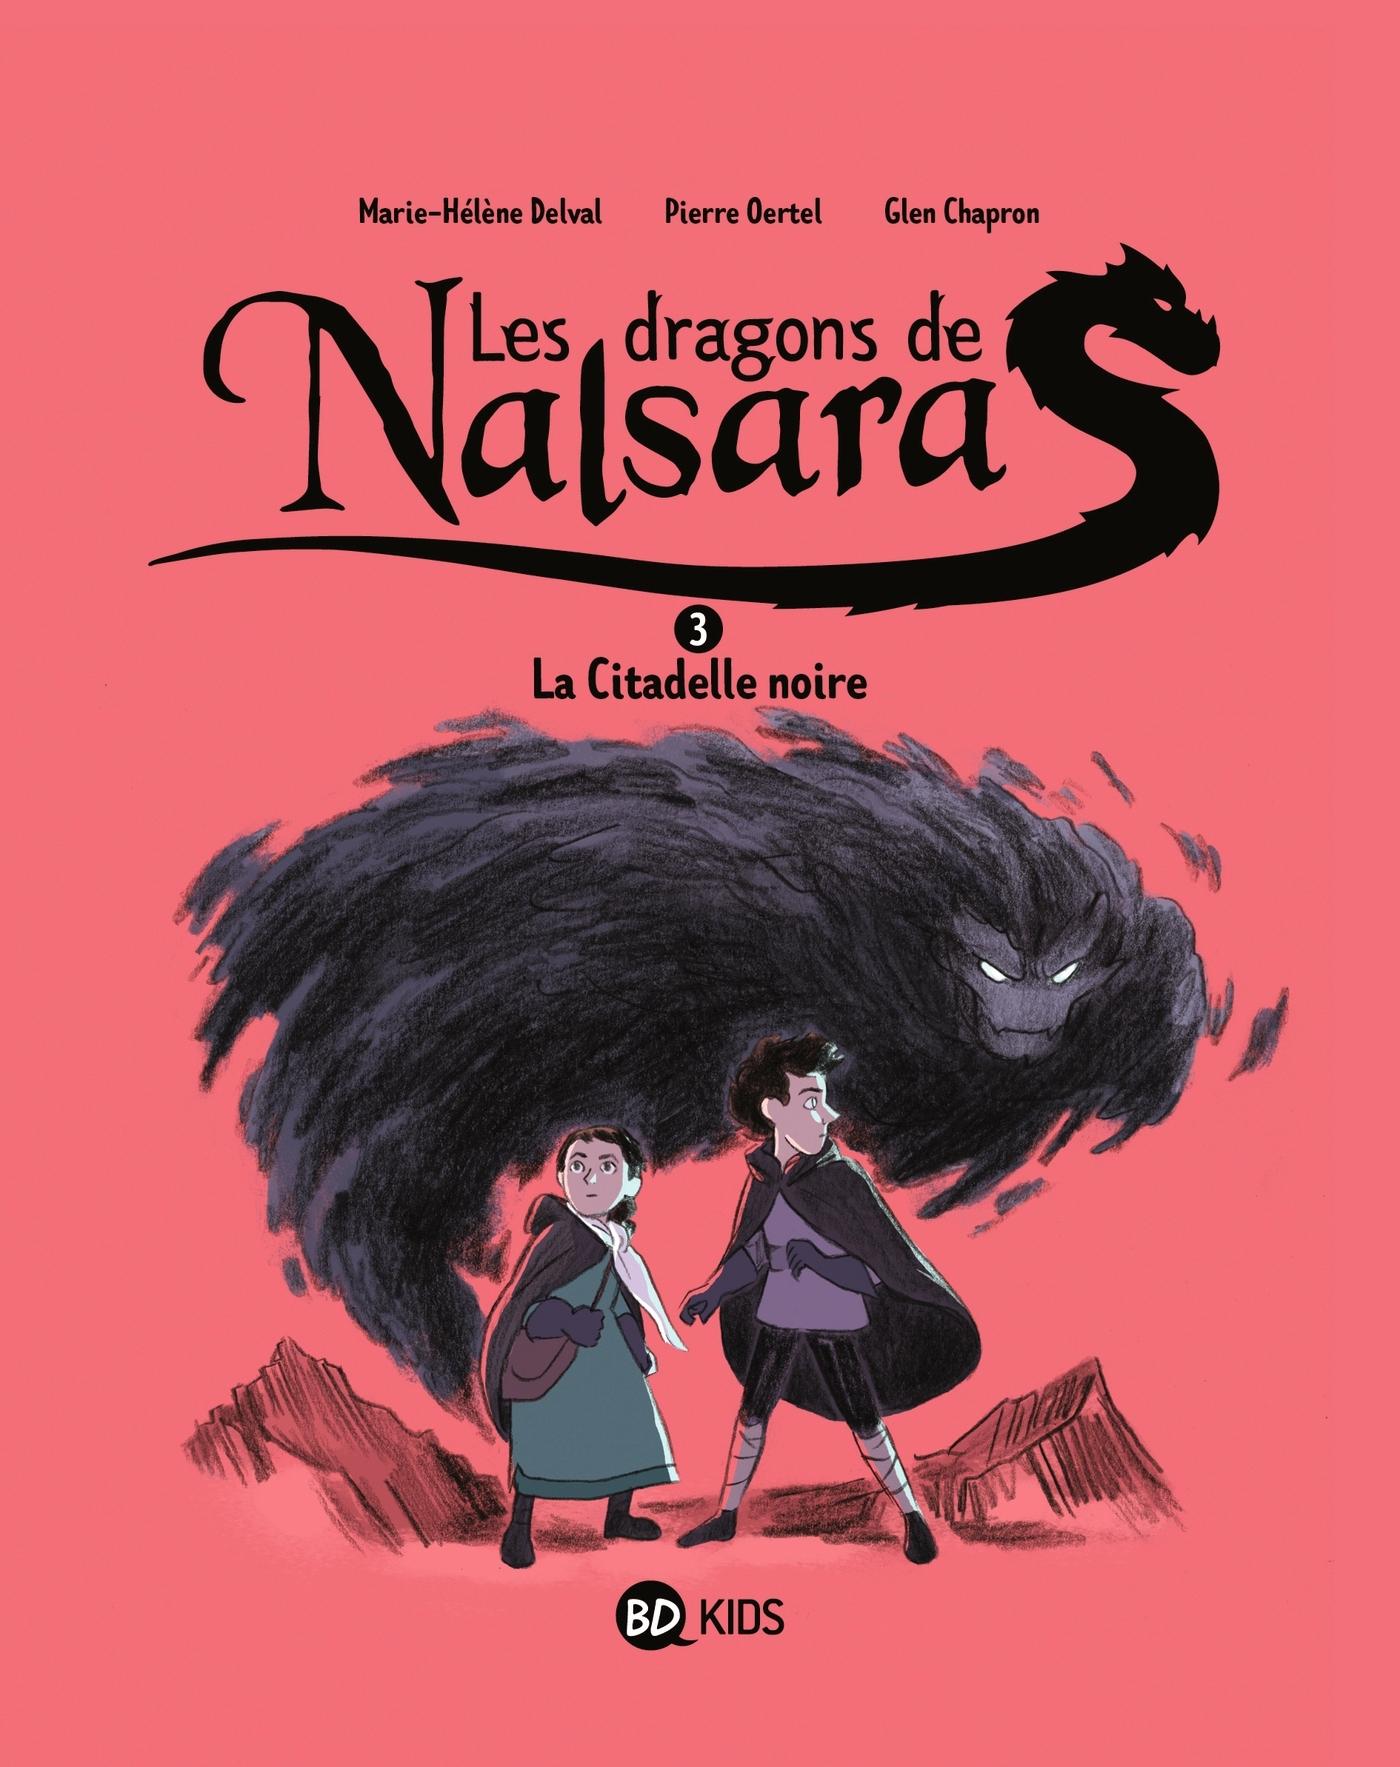 LES DRAGONS DE NALSARA, TOME 03 - LA CITADELLE NOIRE